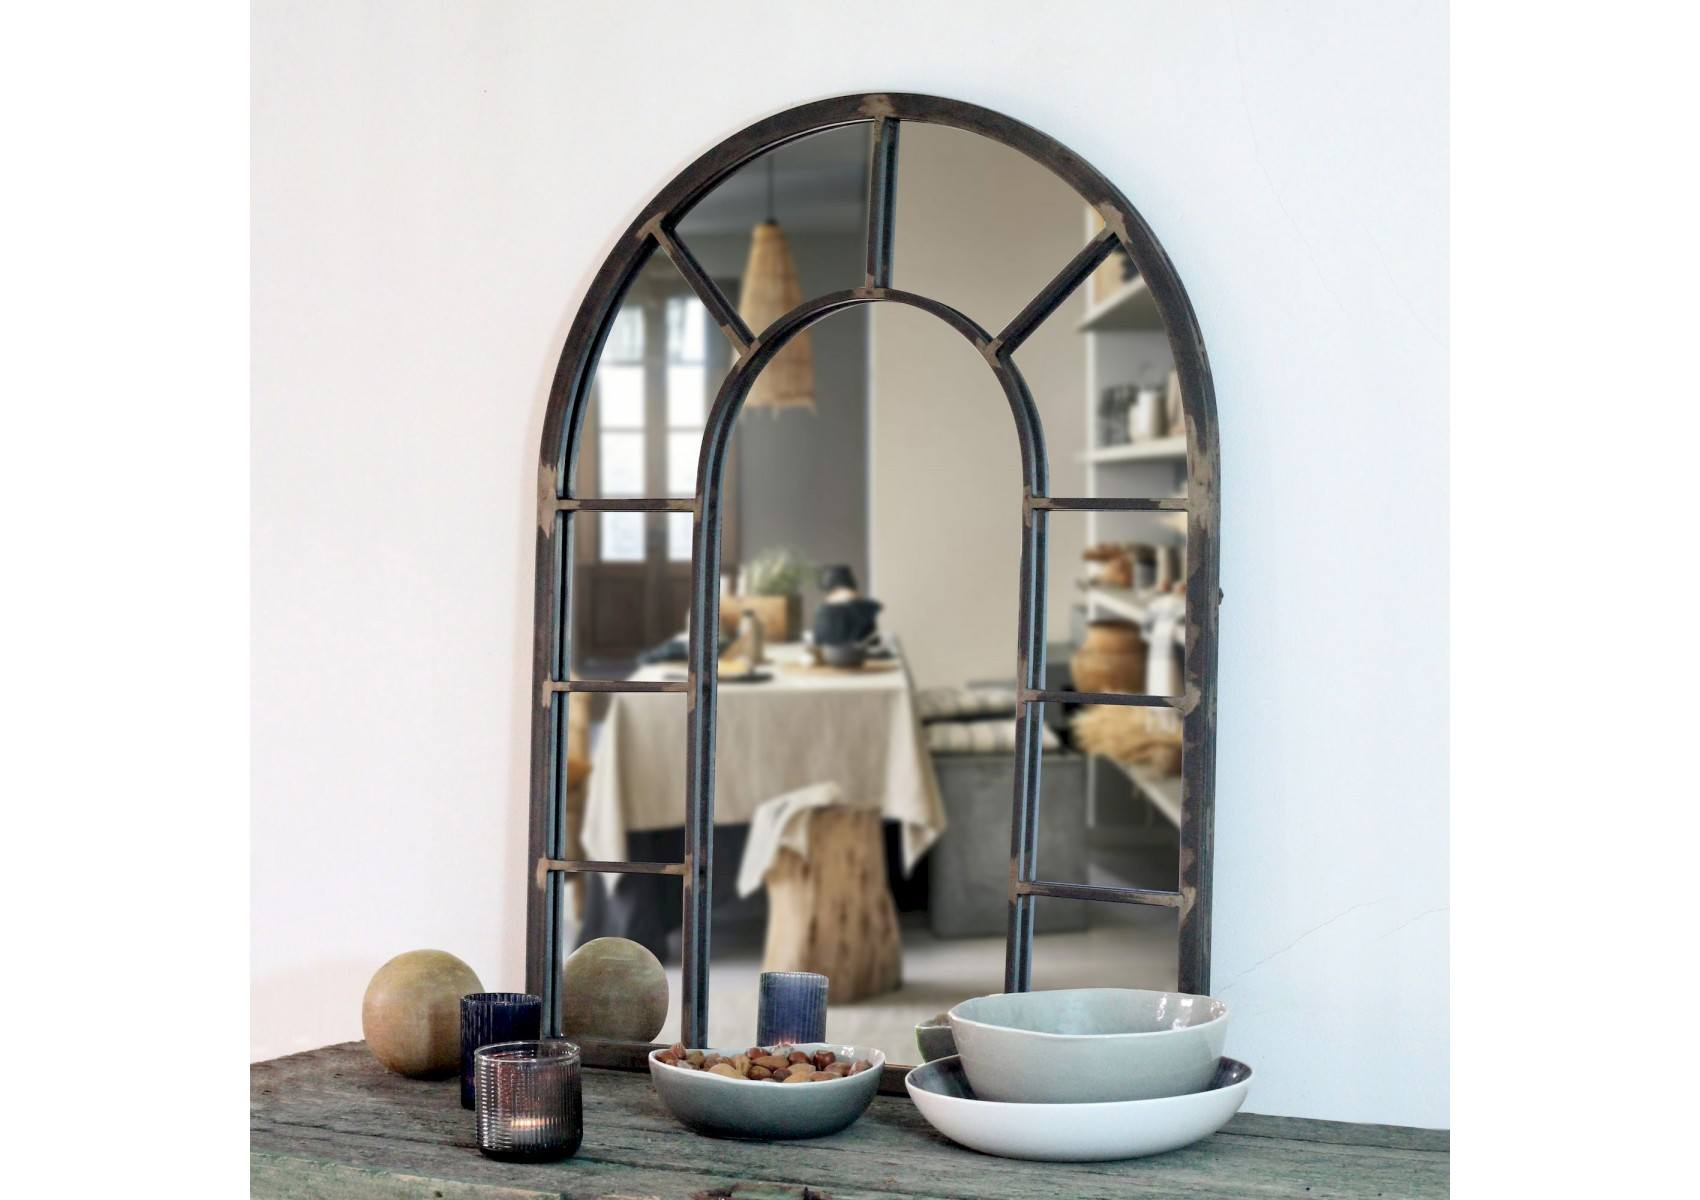 miroir mural rivoli imitation verri re m tal naturel. Black Bedroom Furniture Sets. Home Design Ideas